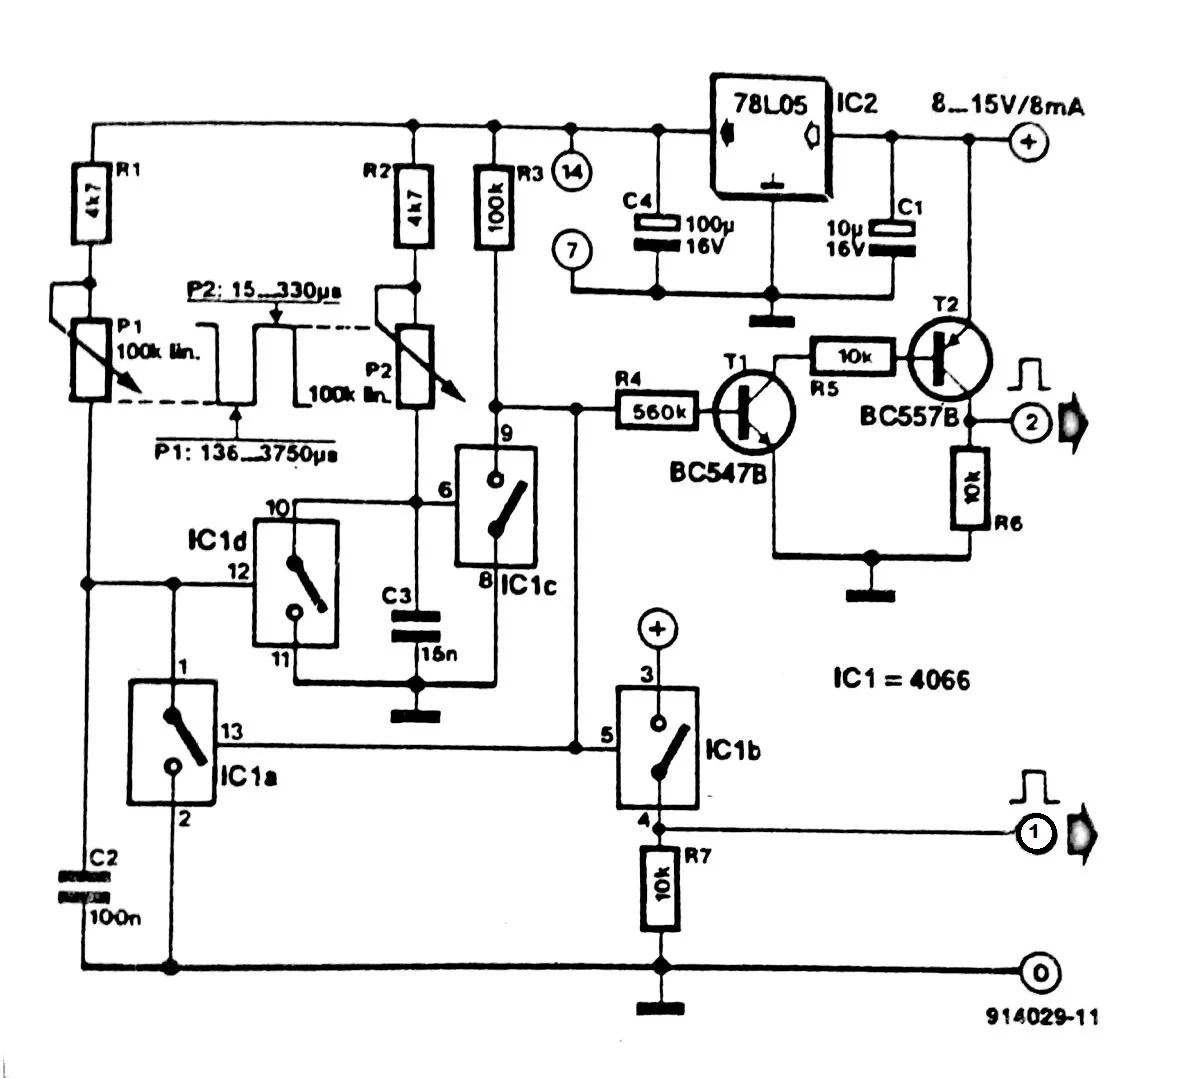 generac 2 pole transfer switch wiring diagram generac